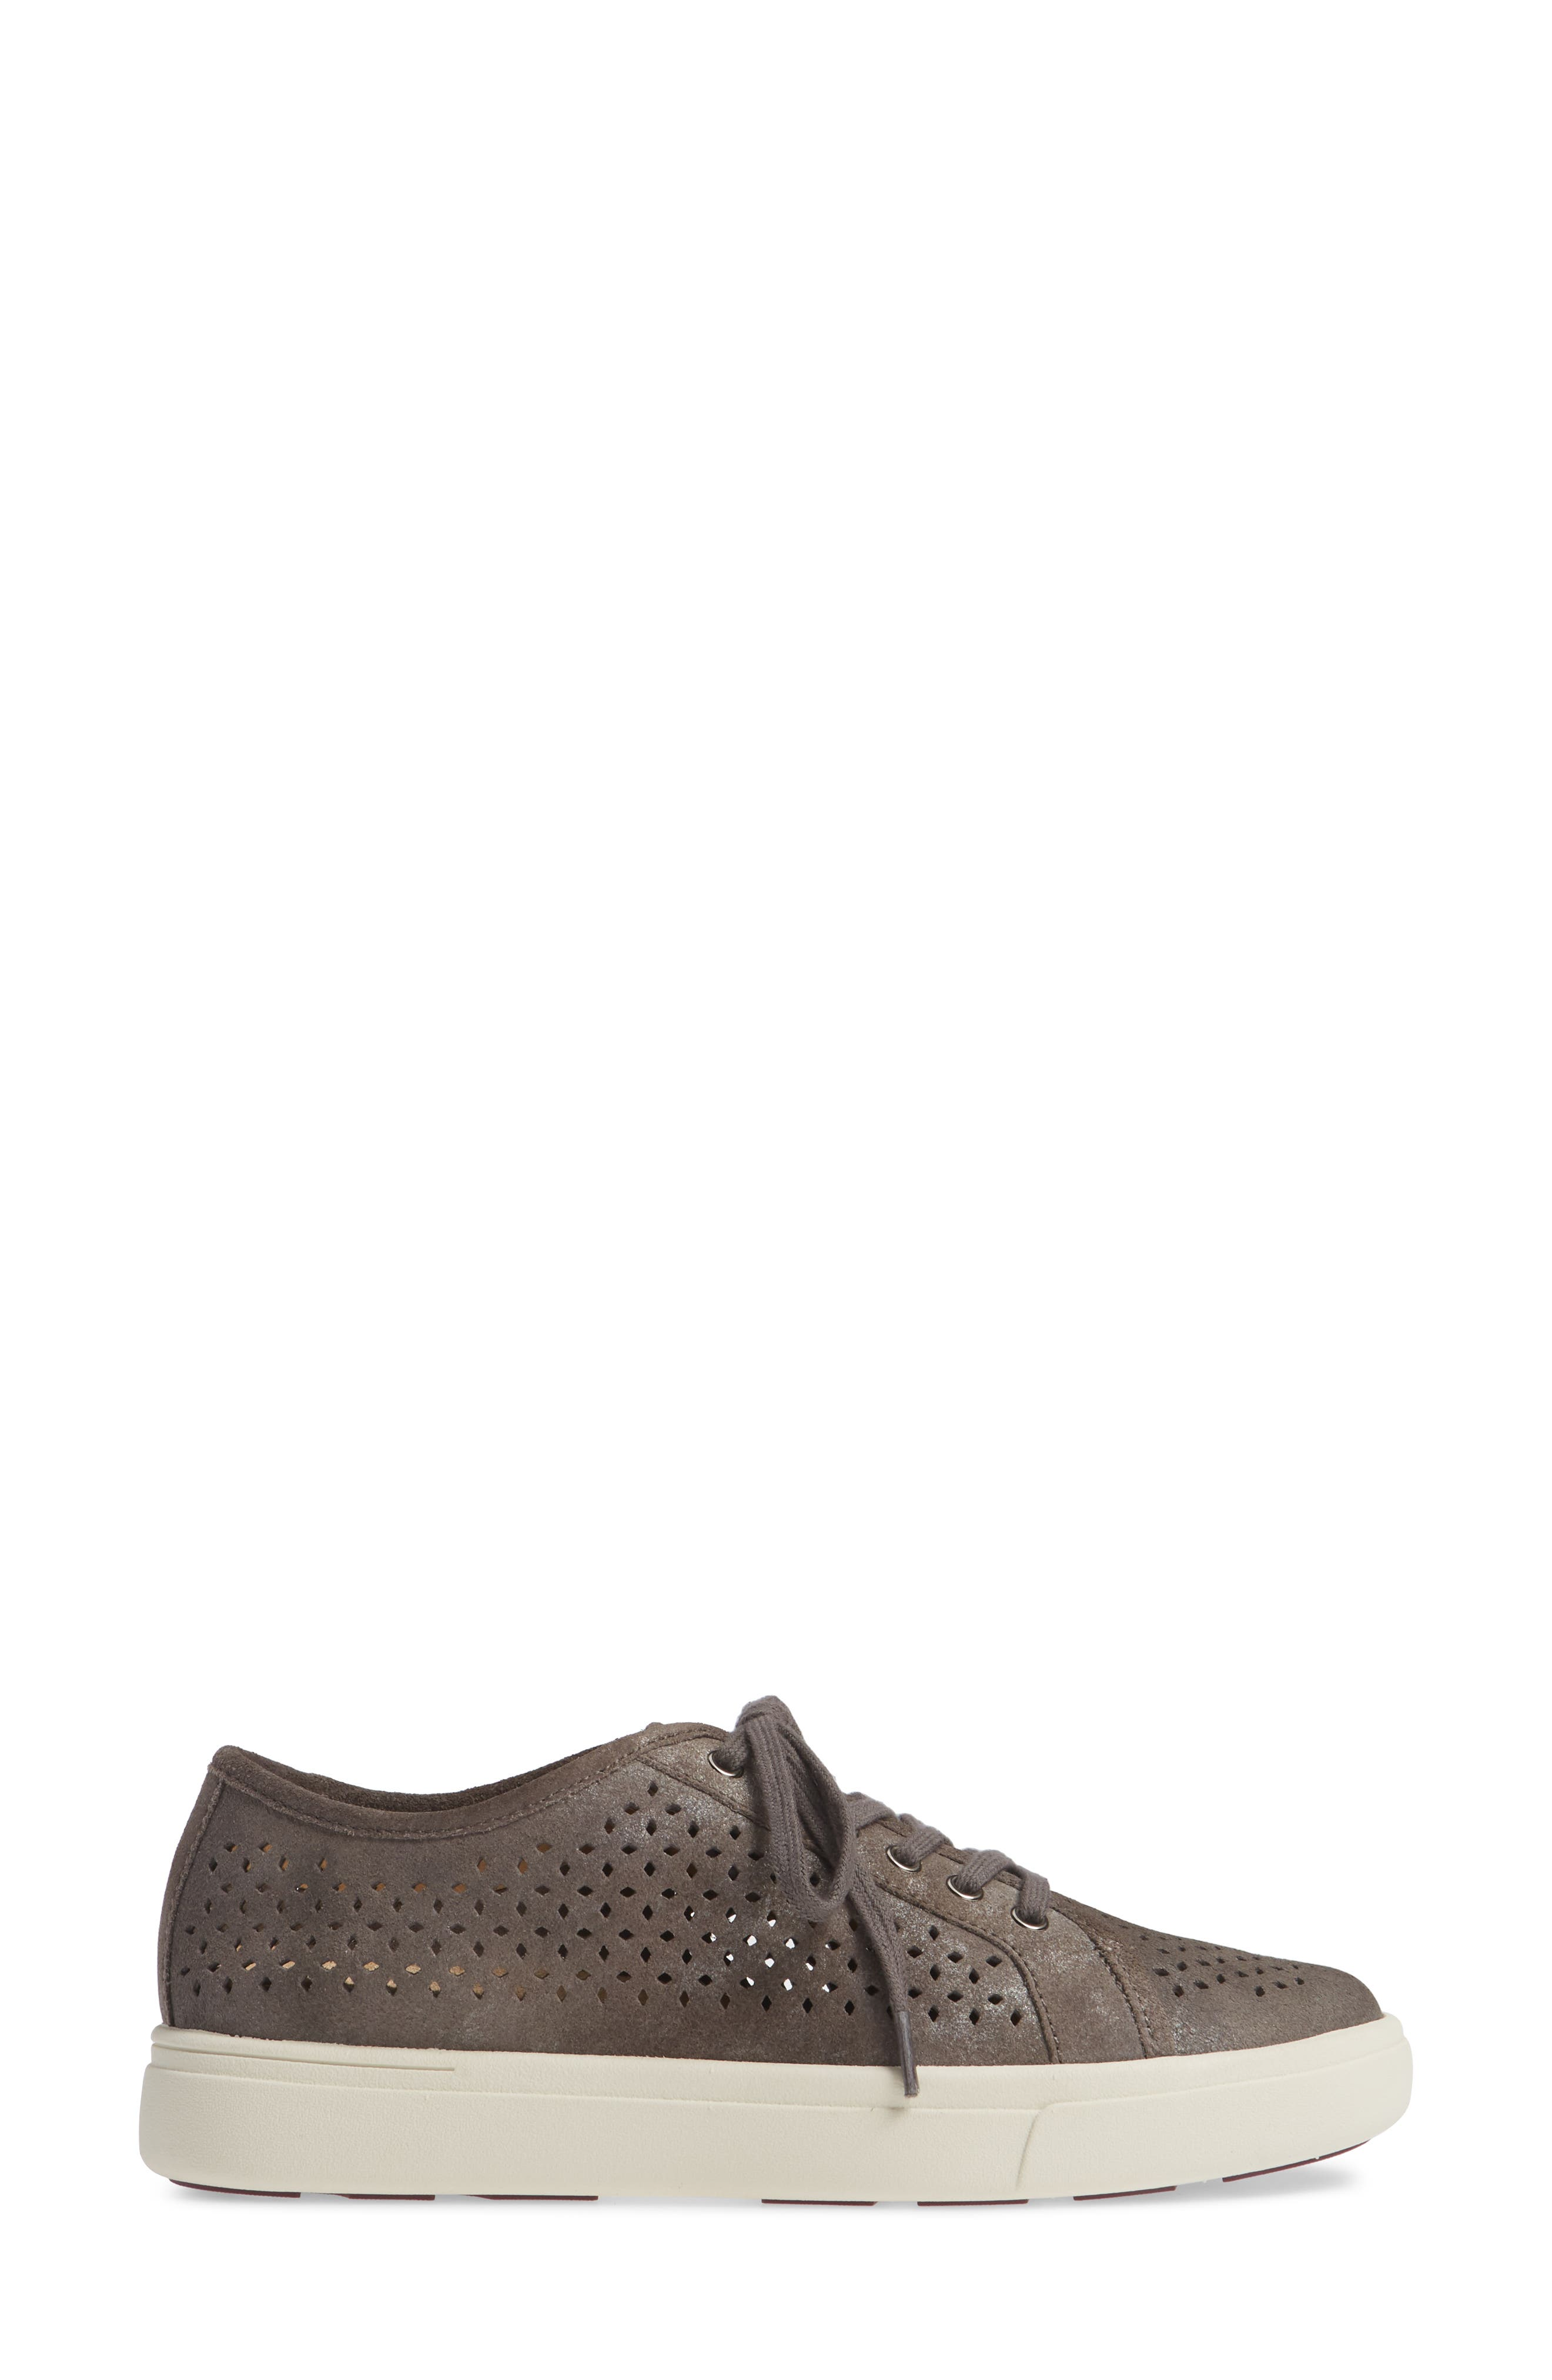 Oneida Sneaker,                             Alternate thumbnail 3, color,                             GREY SUEDE